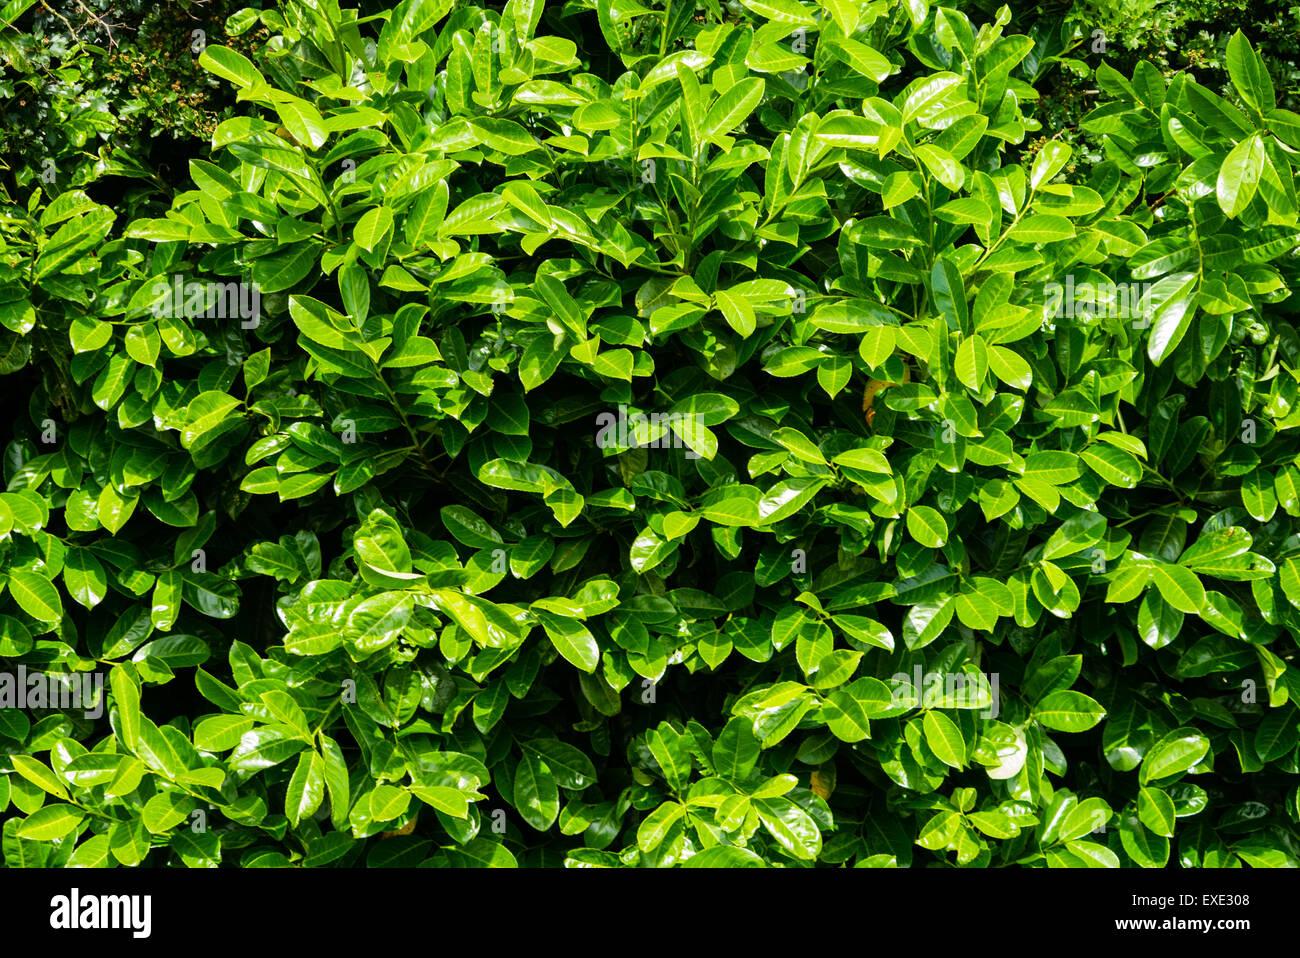 Laurel hedge, prunus laurocerasus - Stock Image